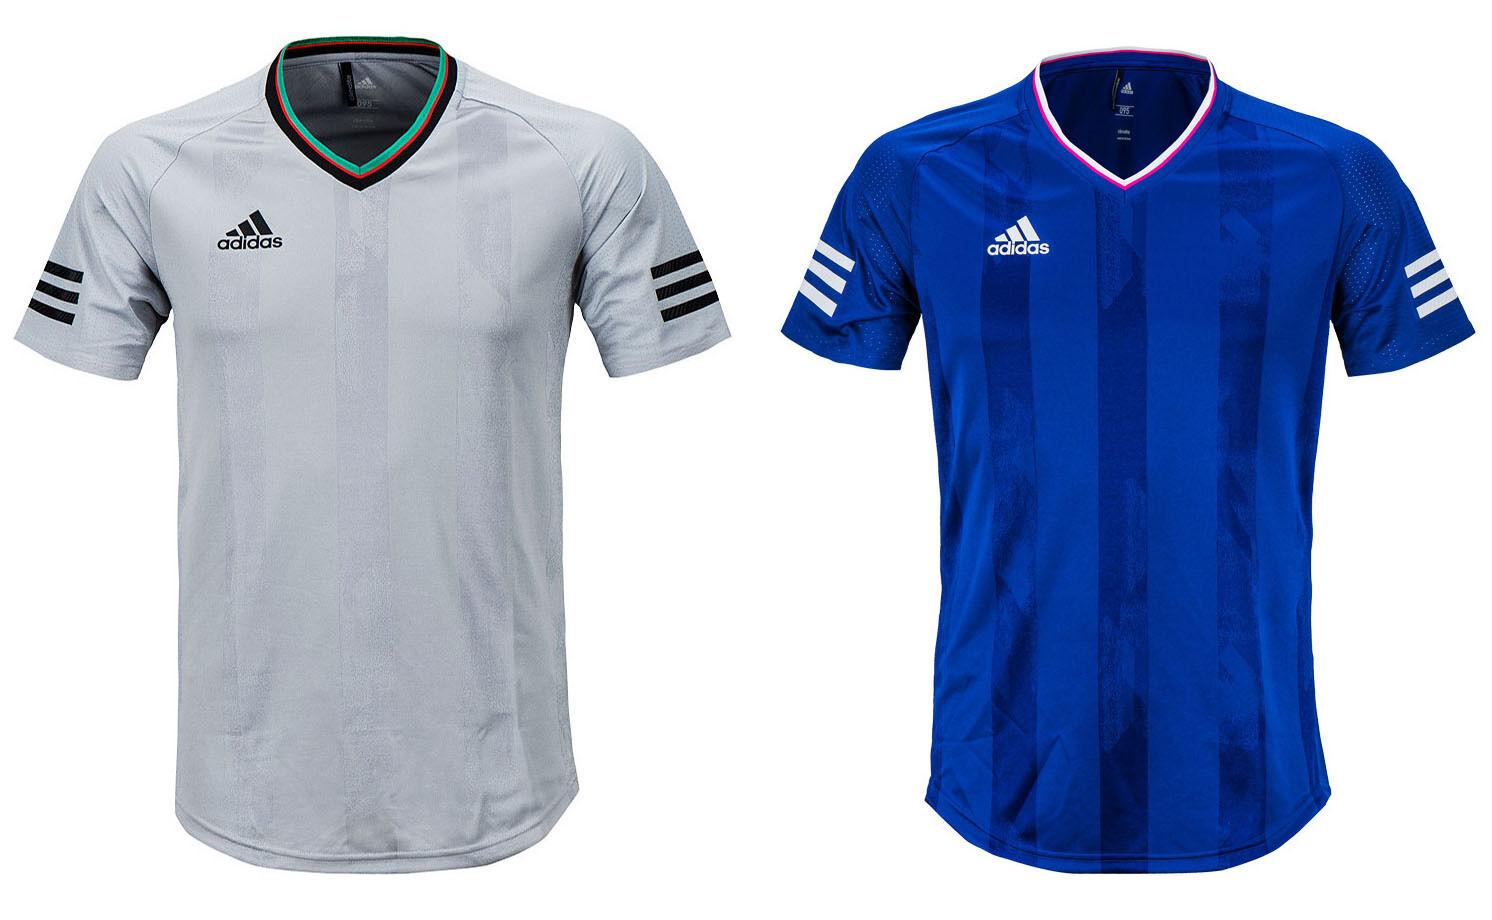 Adidas Tango Futuro S S Camiseta Gimnasio De Entrenamiento De Fútbol De AZ3591 AZ3590 Top